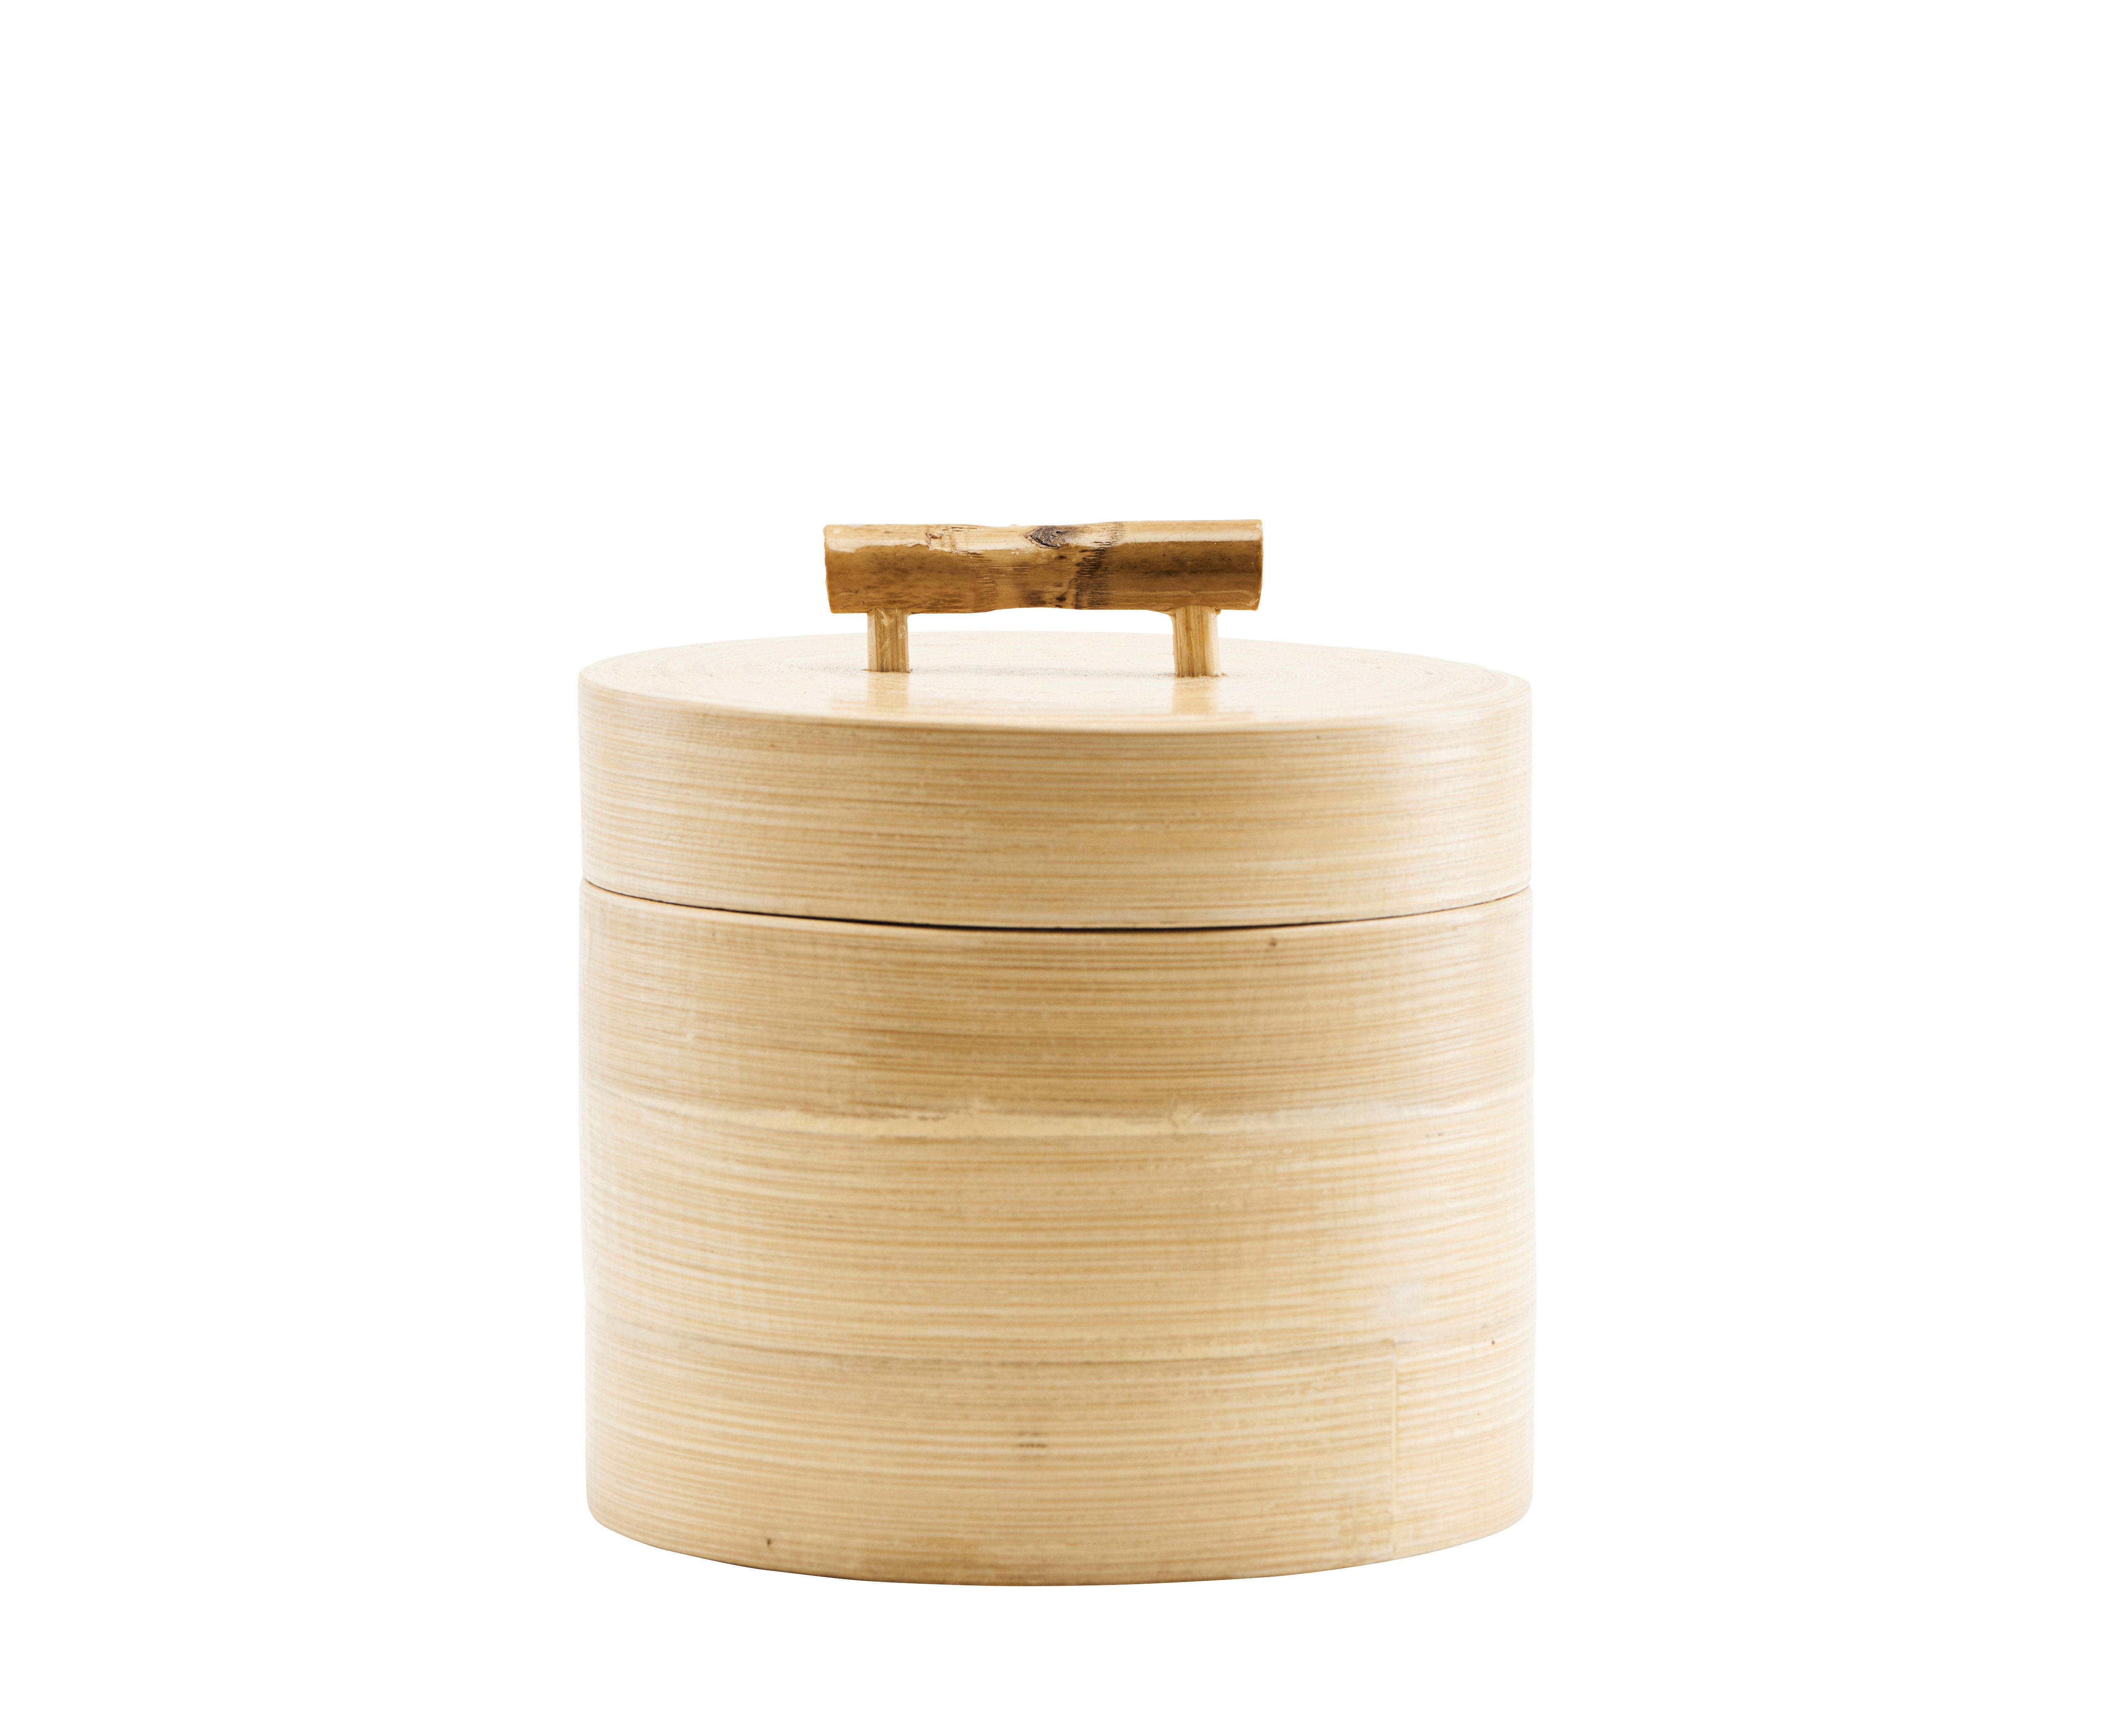 Cucina - Lattine, Pentole e Vasi - Scatola Bamboo - / Ø 12 x H 10 cm di House Doctor - Ø 12 x H 10 cm - Bambù